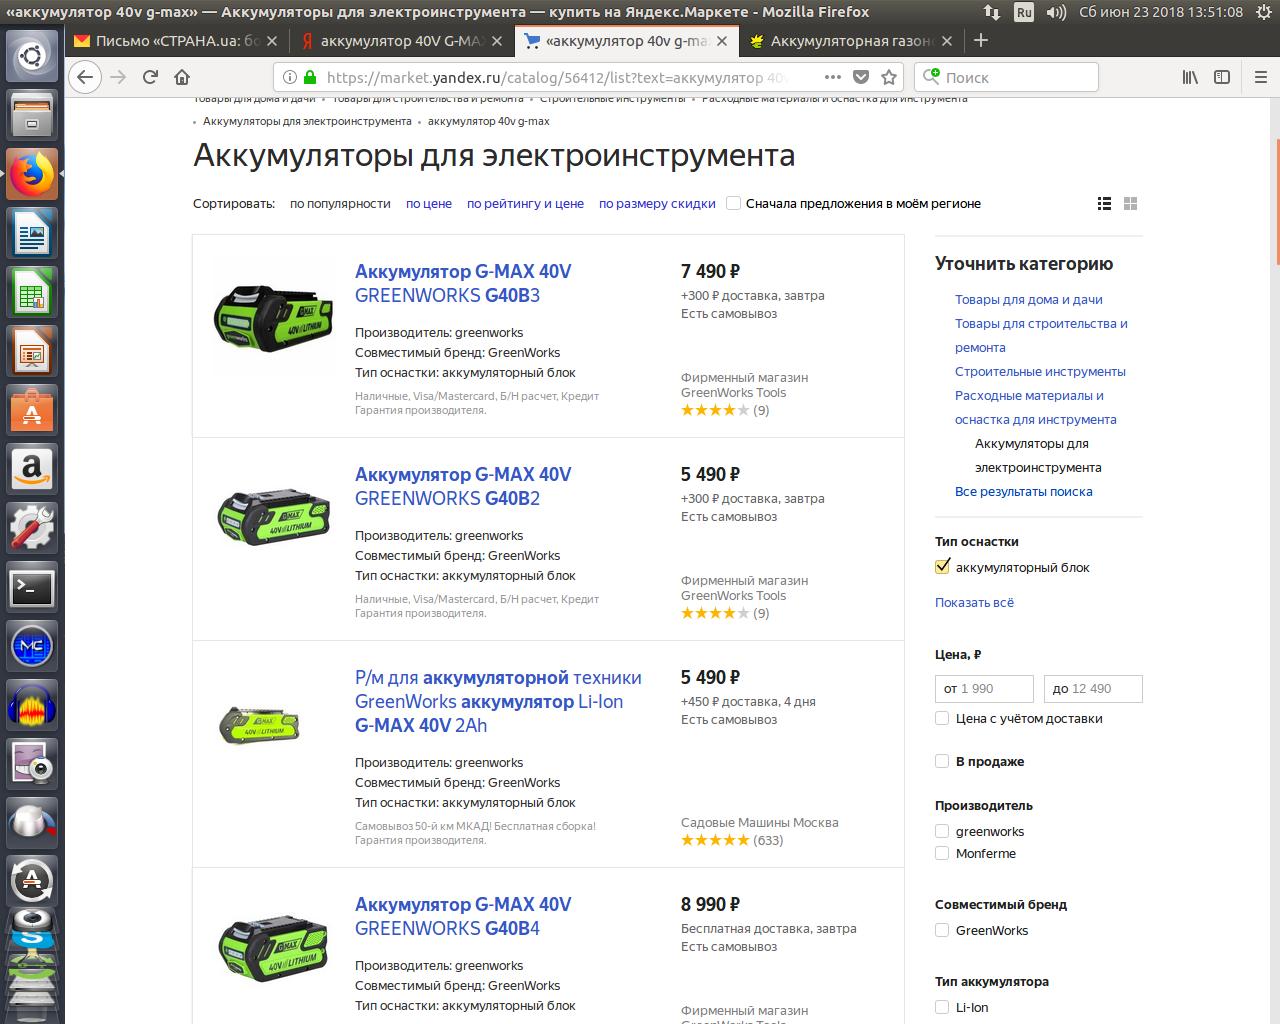 http://i1.imageban.ru/out/2018/06/23/7138e5f22802976aed76112e67365945.png